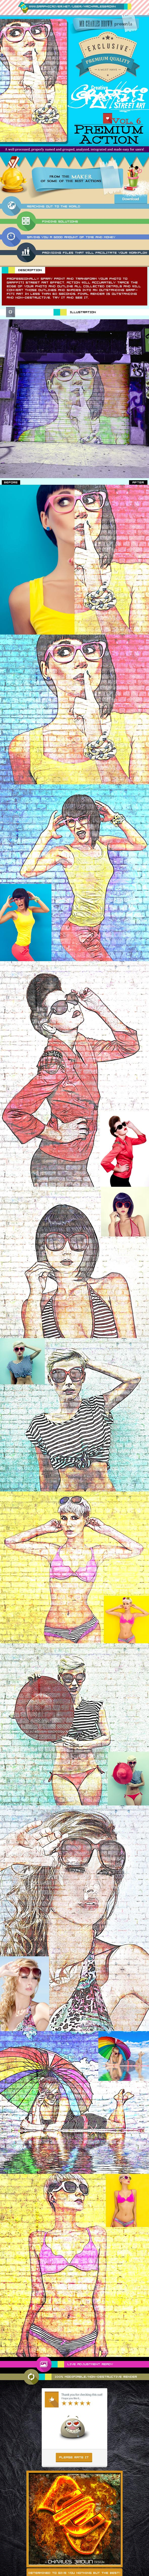 Creative Graffiti Street Art Vol. 6 - Photo Effects Actions